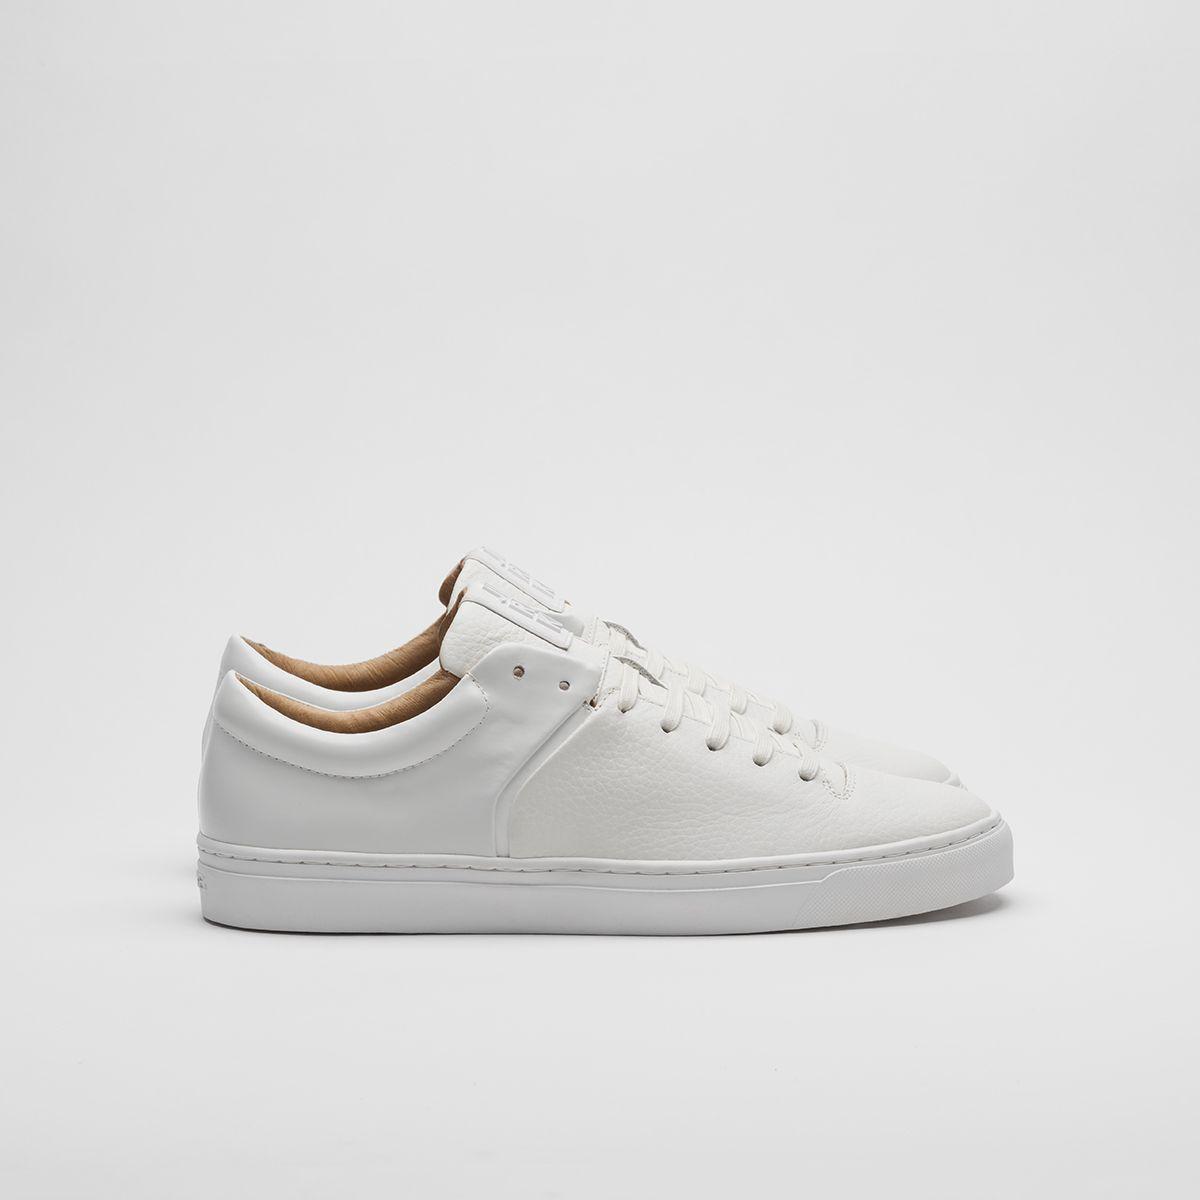 Jim Rickey Cloud - Premium Leather Full White Sneaker, Size 12/46